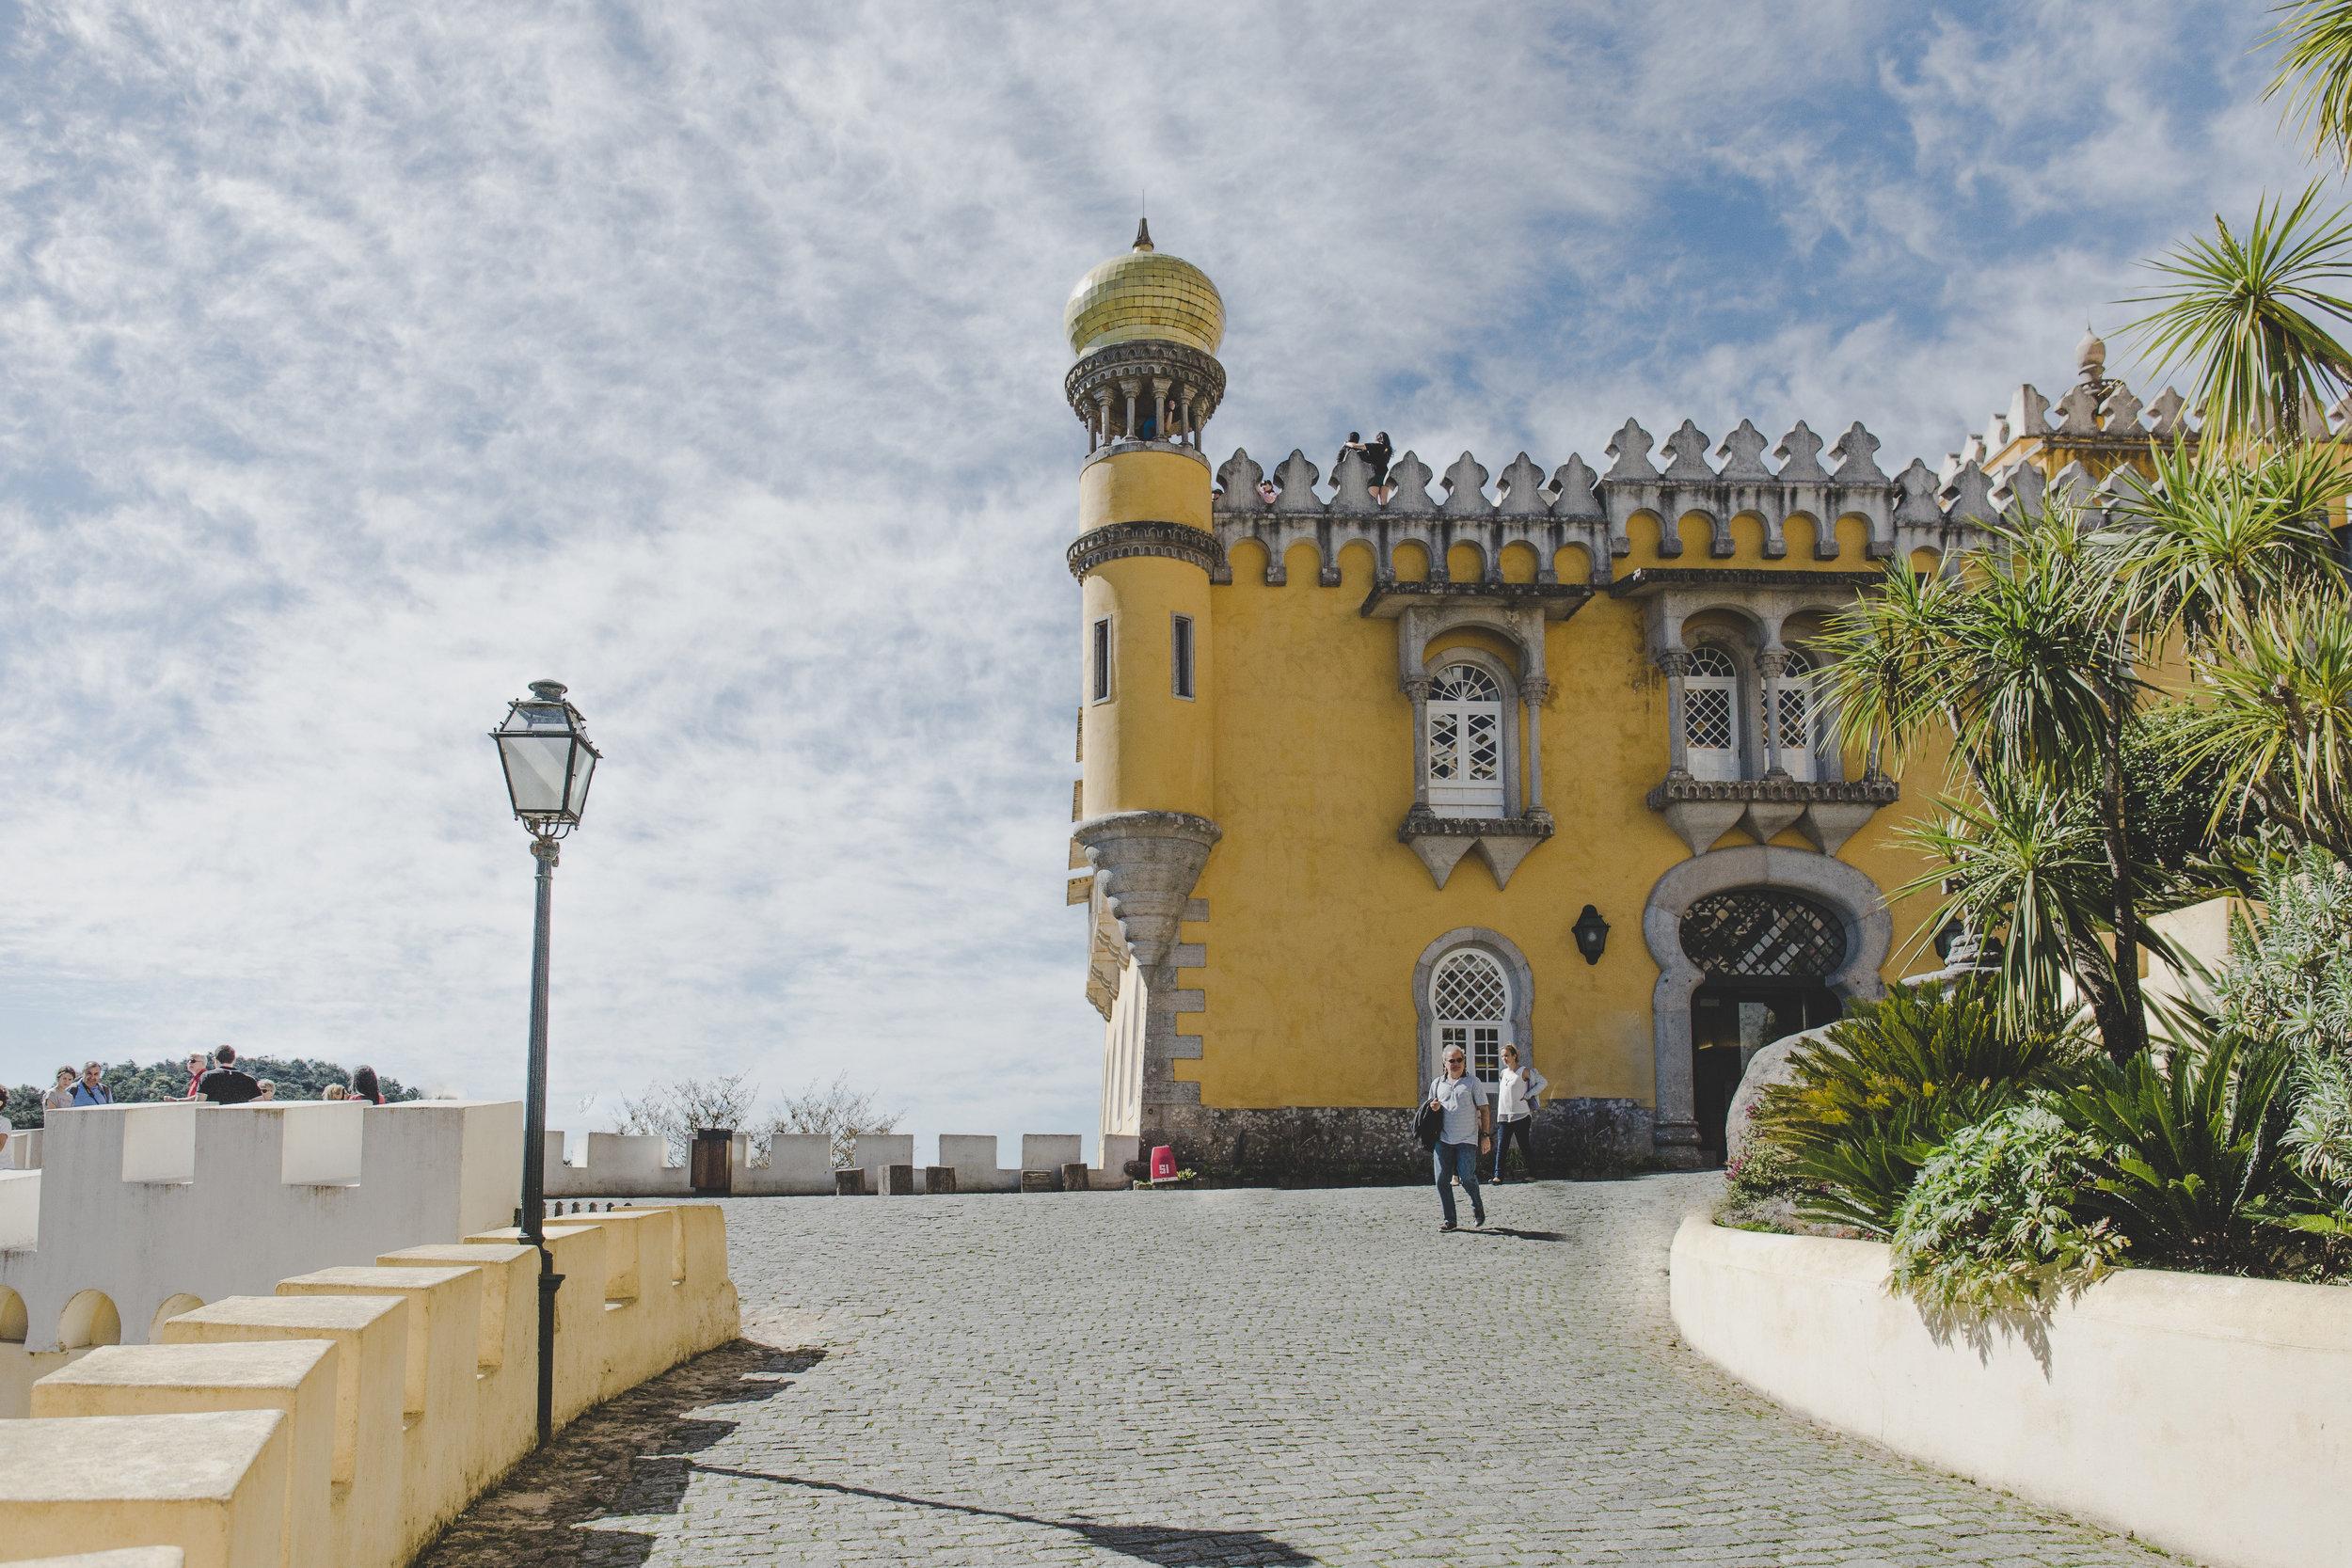 Penà Palace